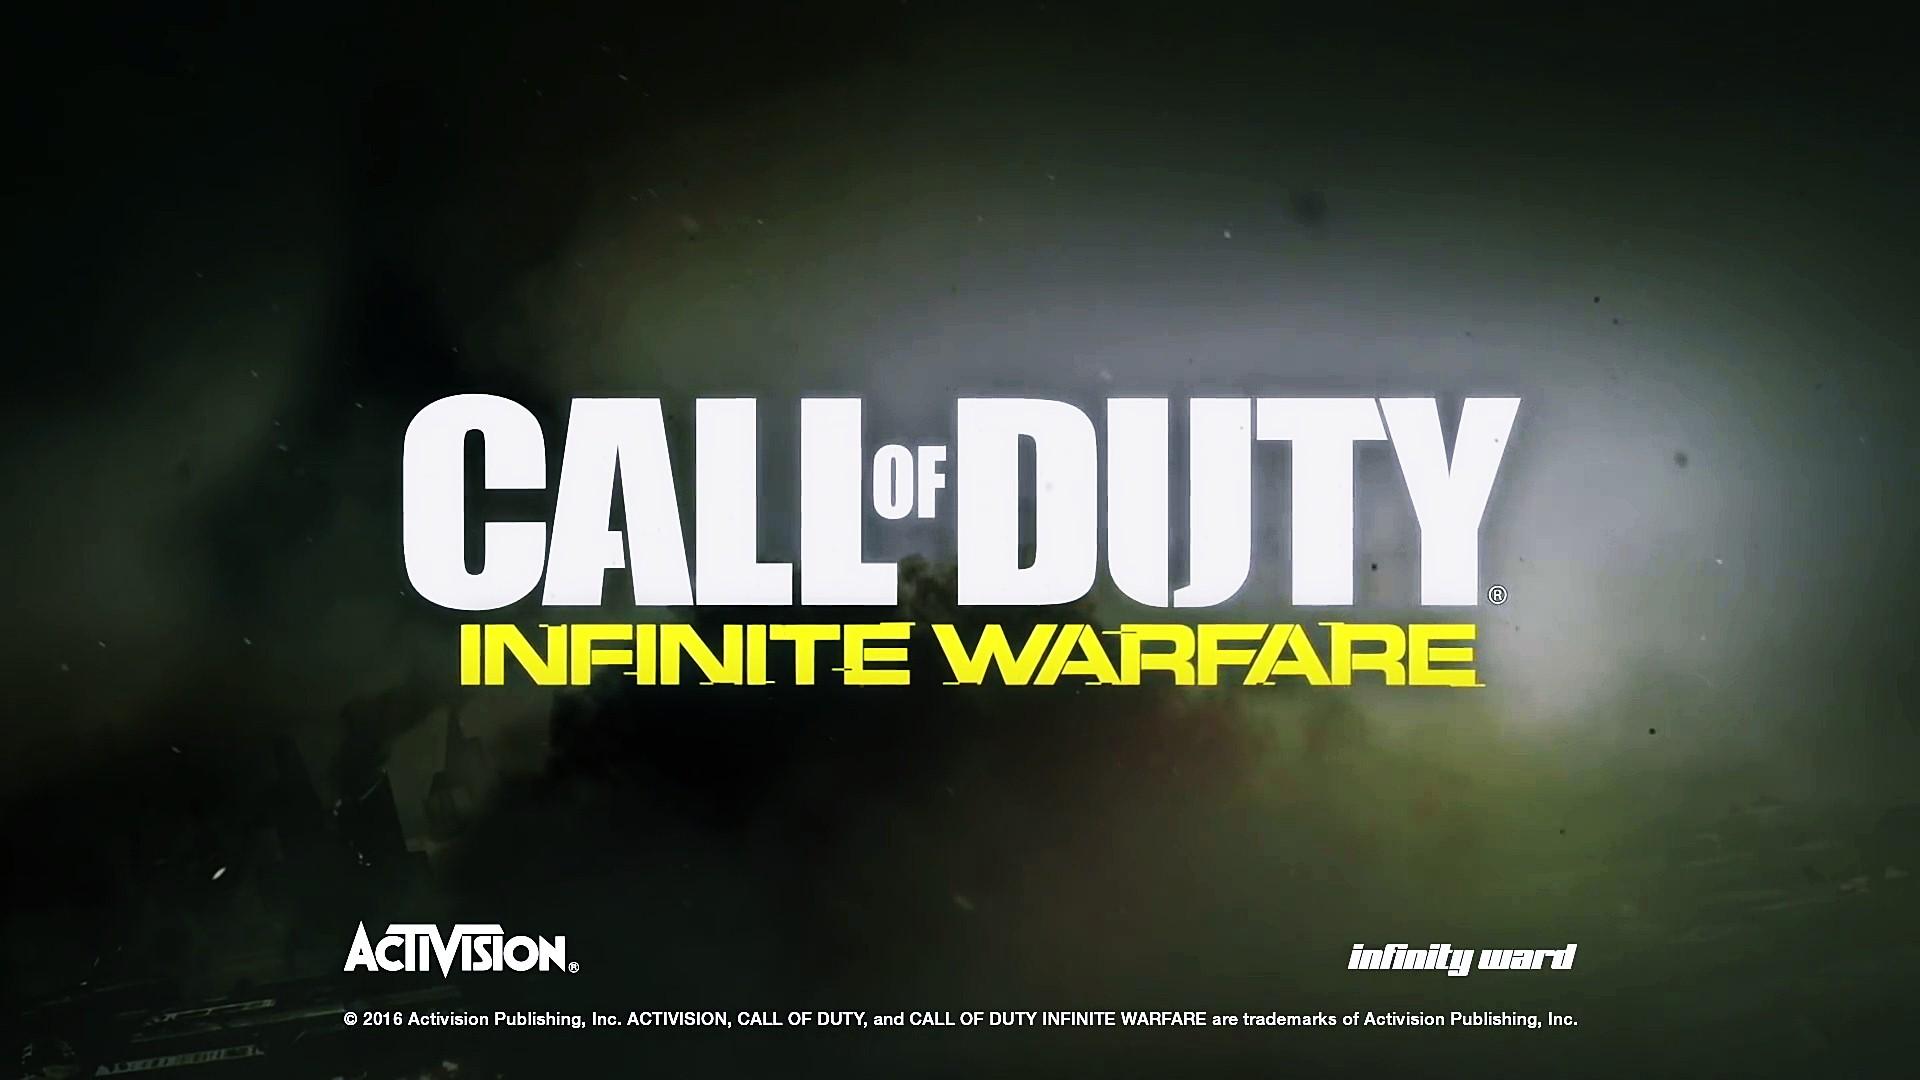 download Call of Duty Infinite Warfare Logo Wallpaper 00081 1920x1080